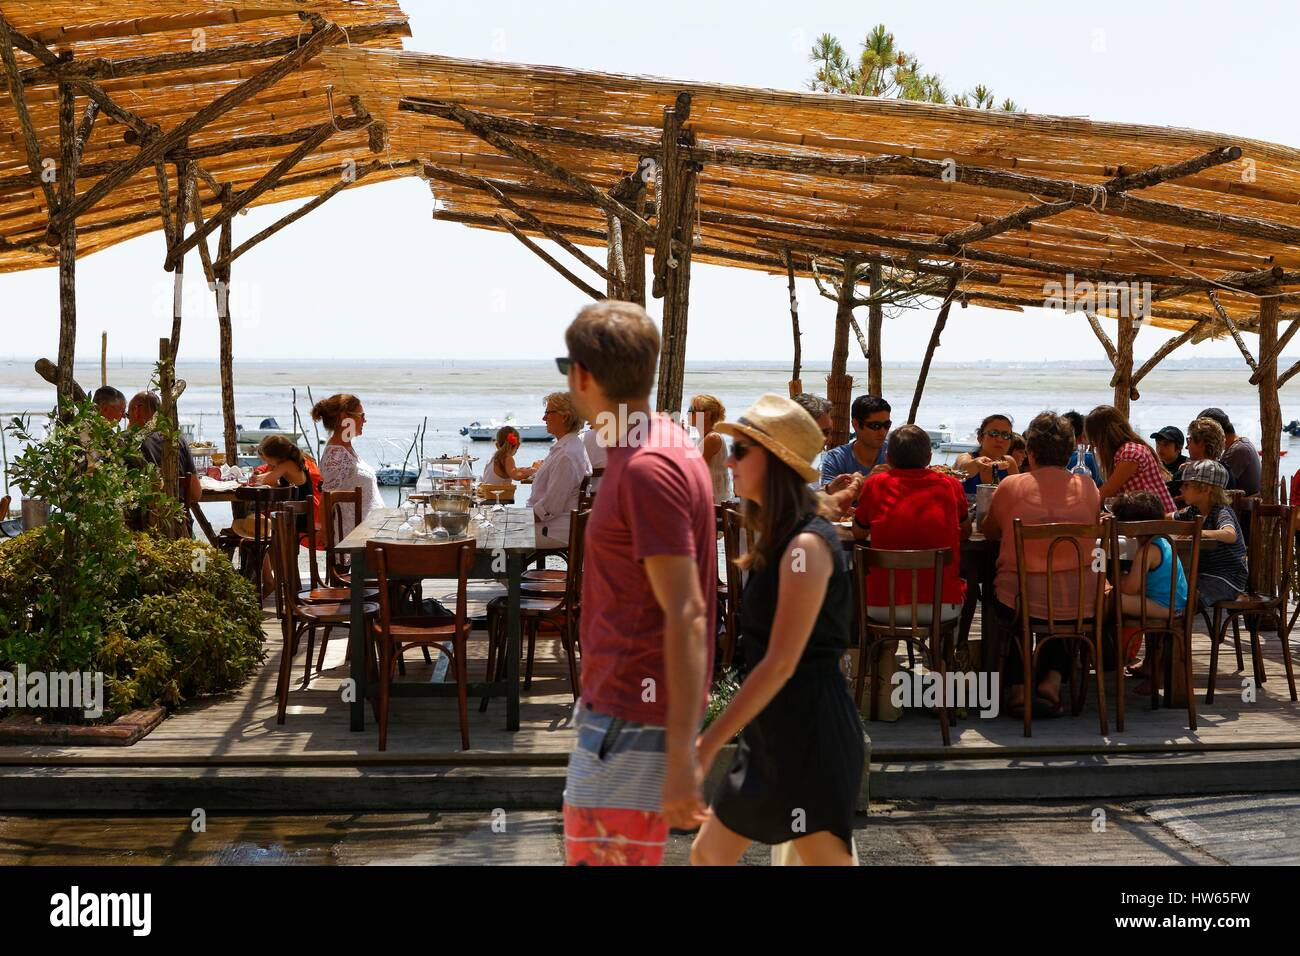 France, Gironde, Bassin d'Arcachon, Cap Ferret, Chez Edouard, oyster restaurant - Stock Image